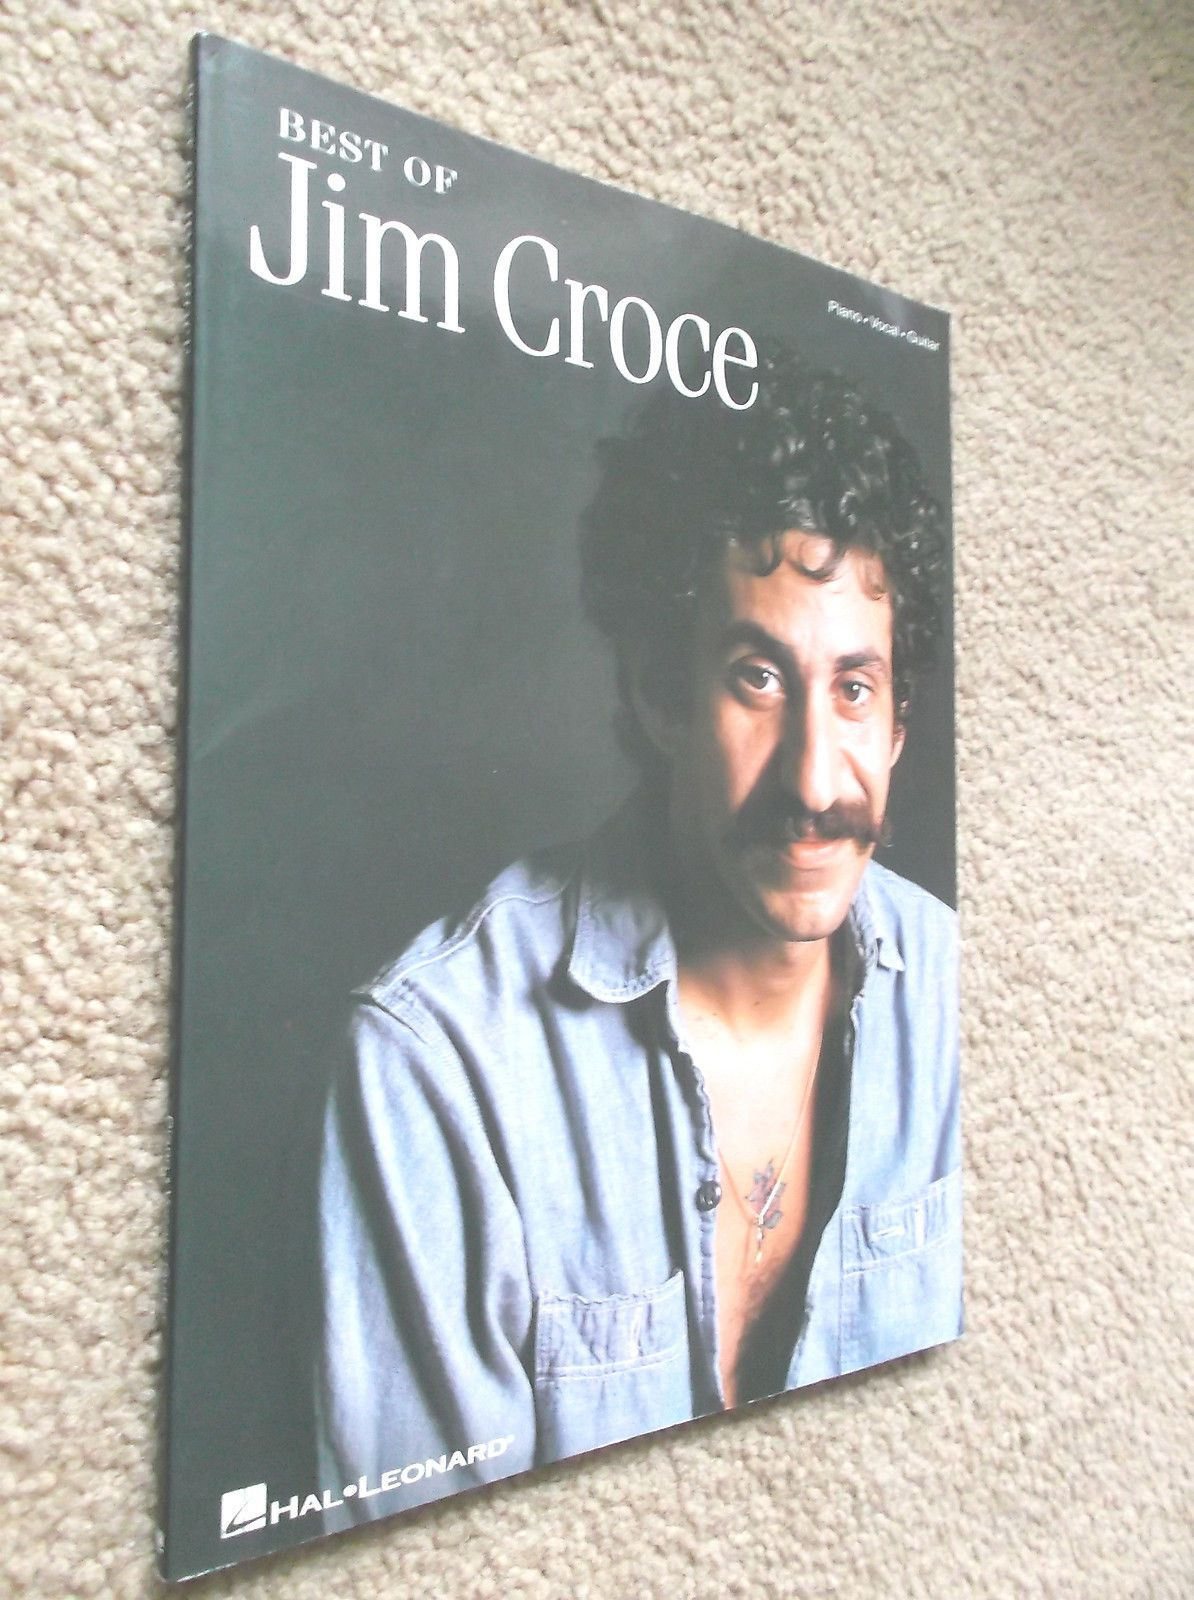 JIM CROCE THE BEST OF GUITAR PIANO ROCK MUSIC SONG BOOK HAL LEONARD ...